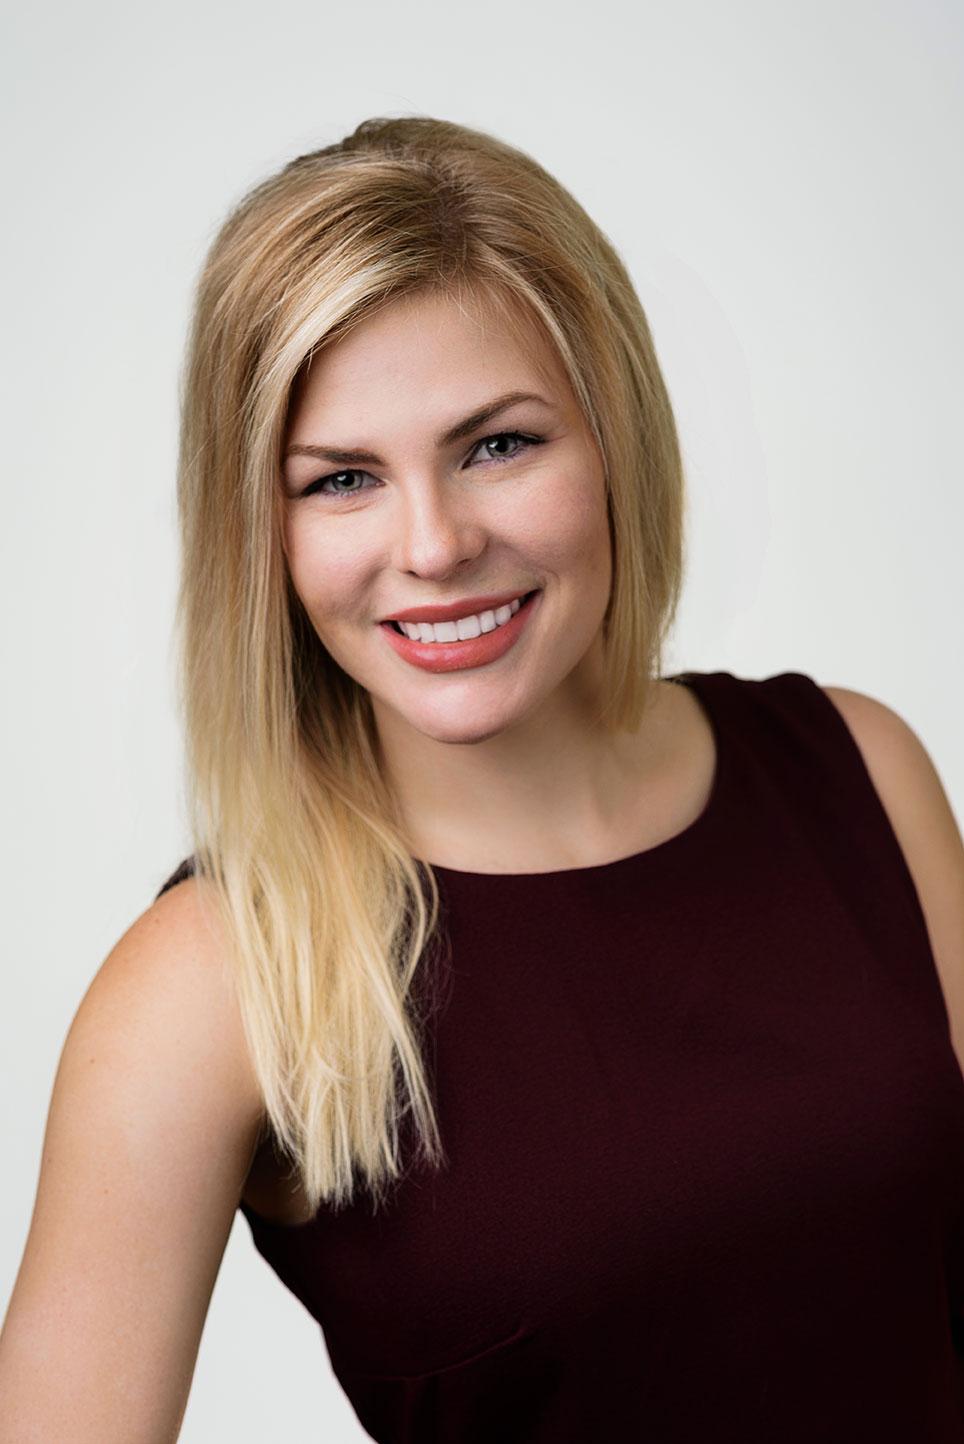 Kristi Scott